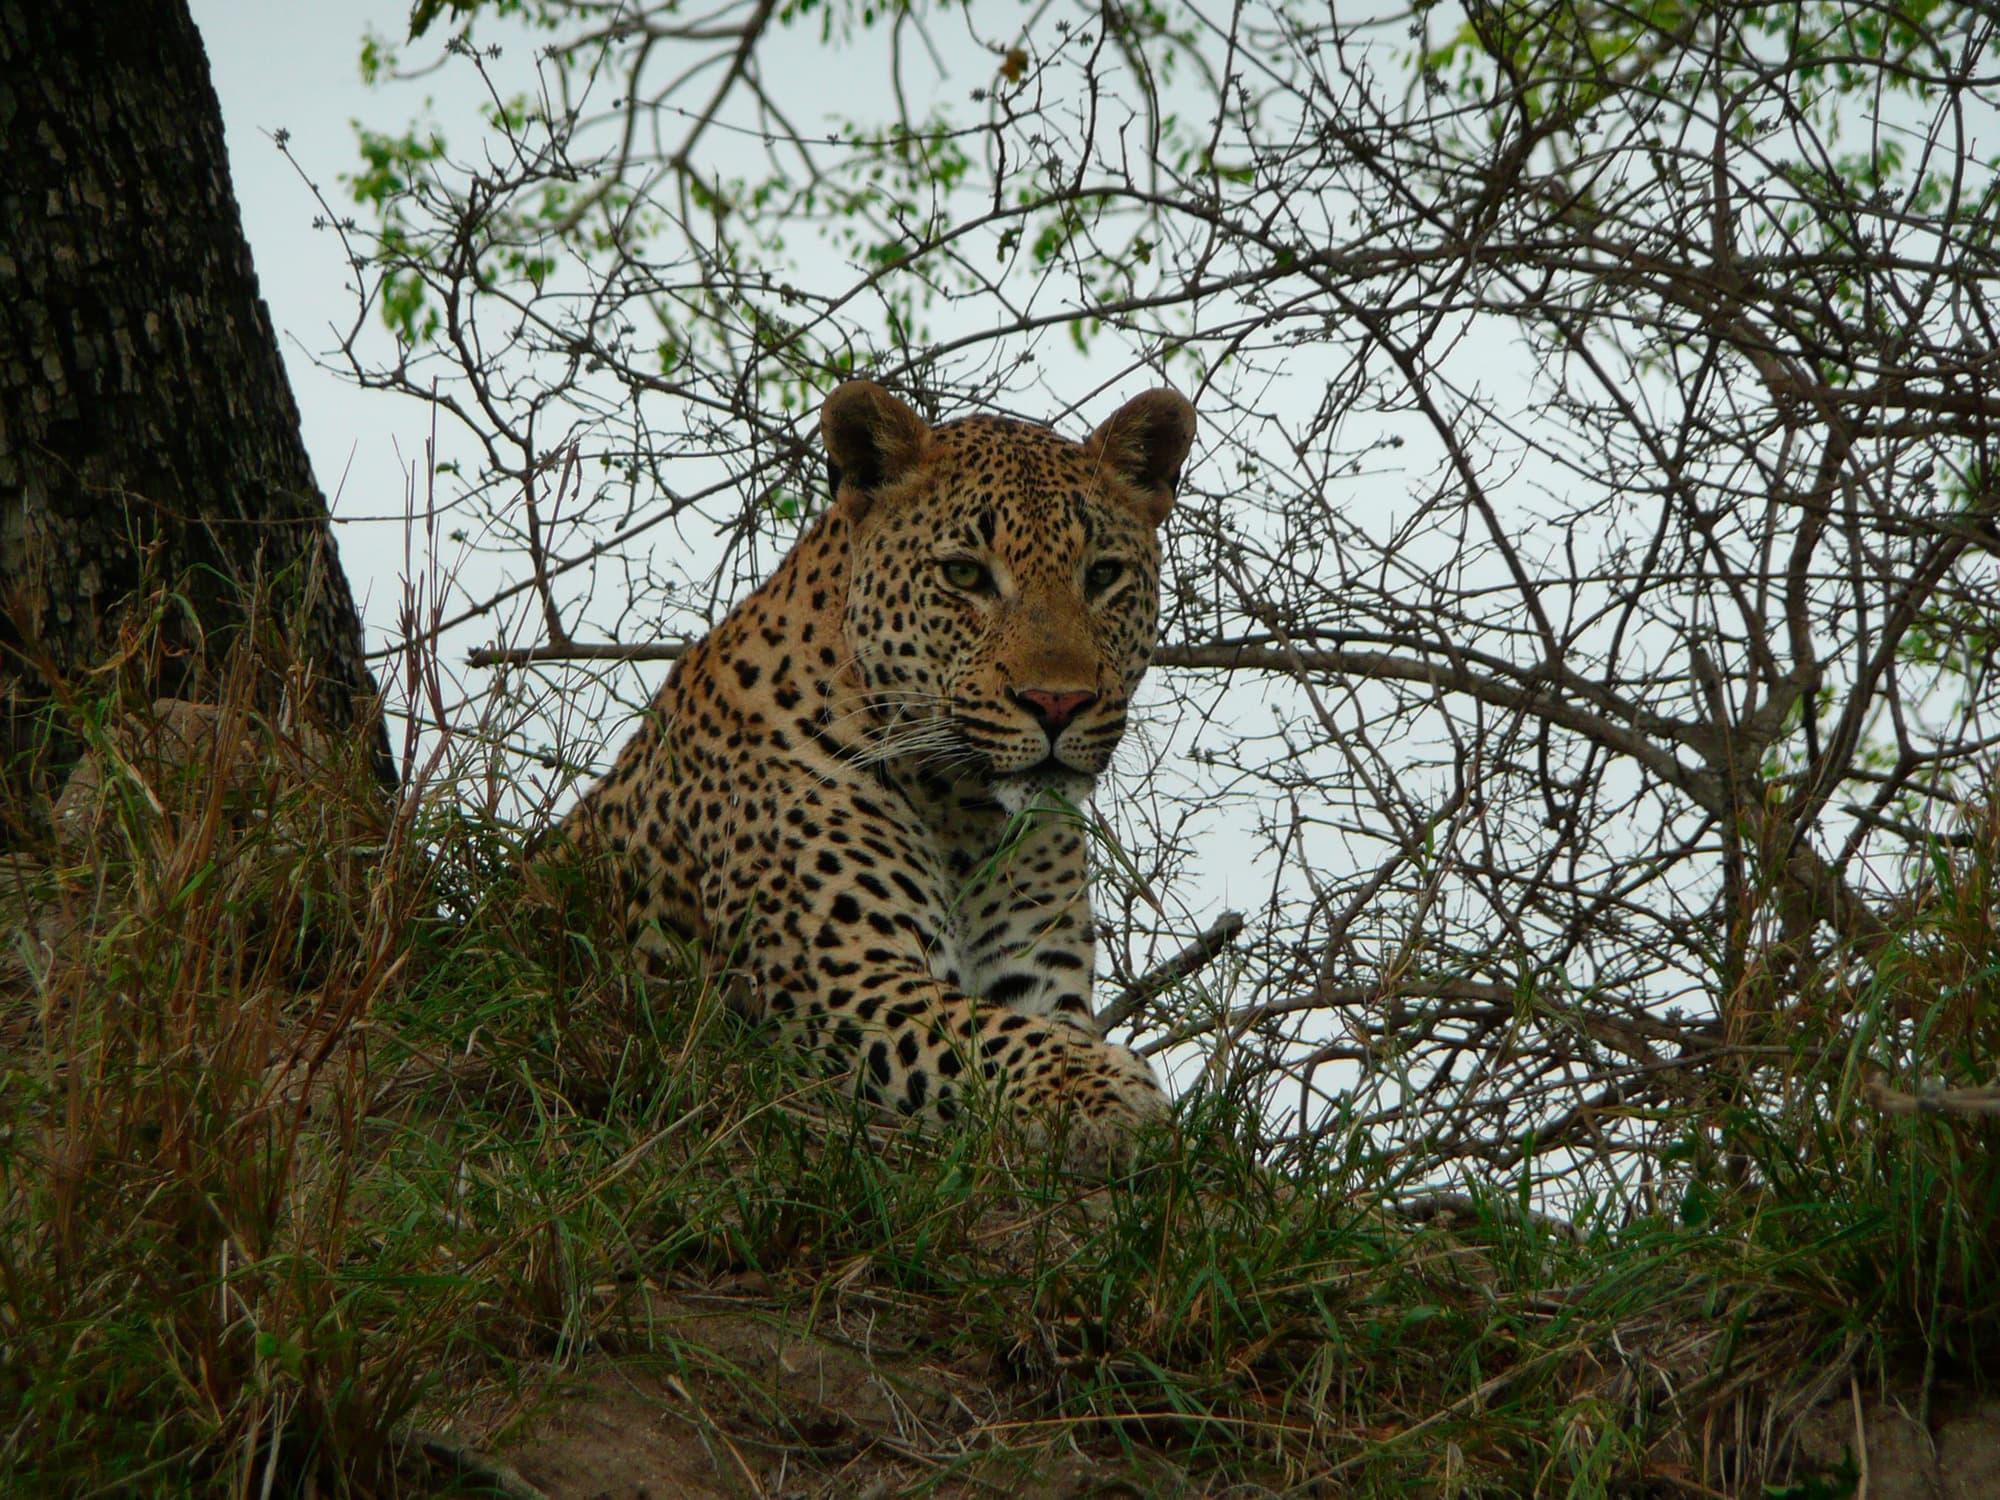 Gran Tour de Sudáfrica, Cataratas Victoria e isla Mauricio - Sudáfrica- imagen #9